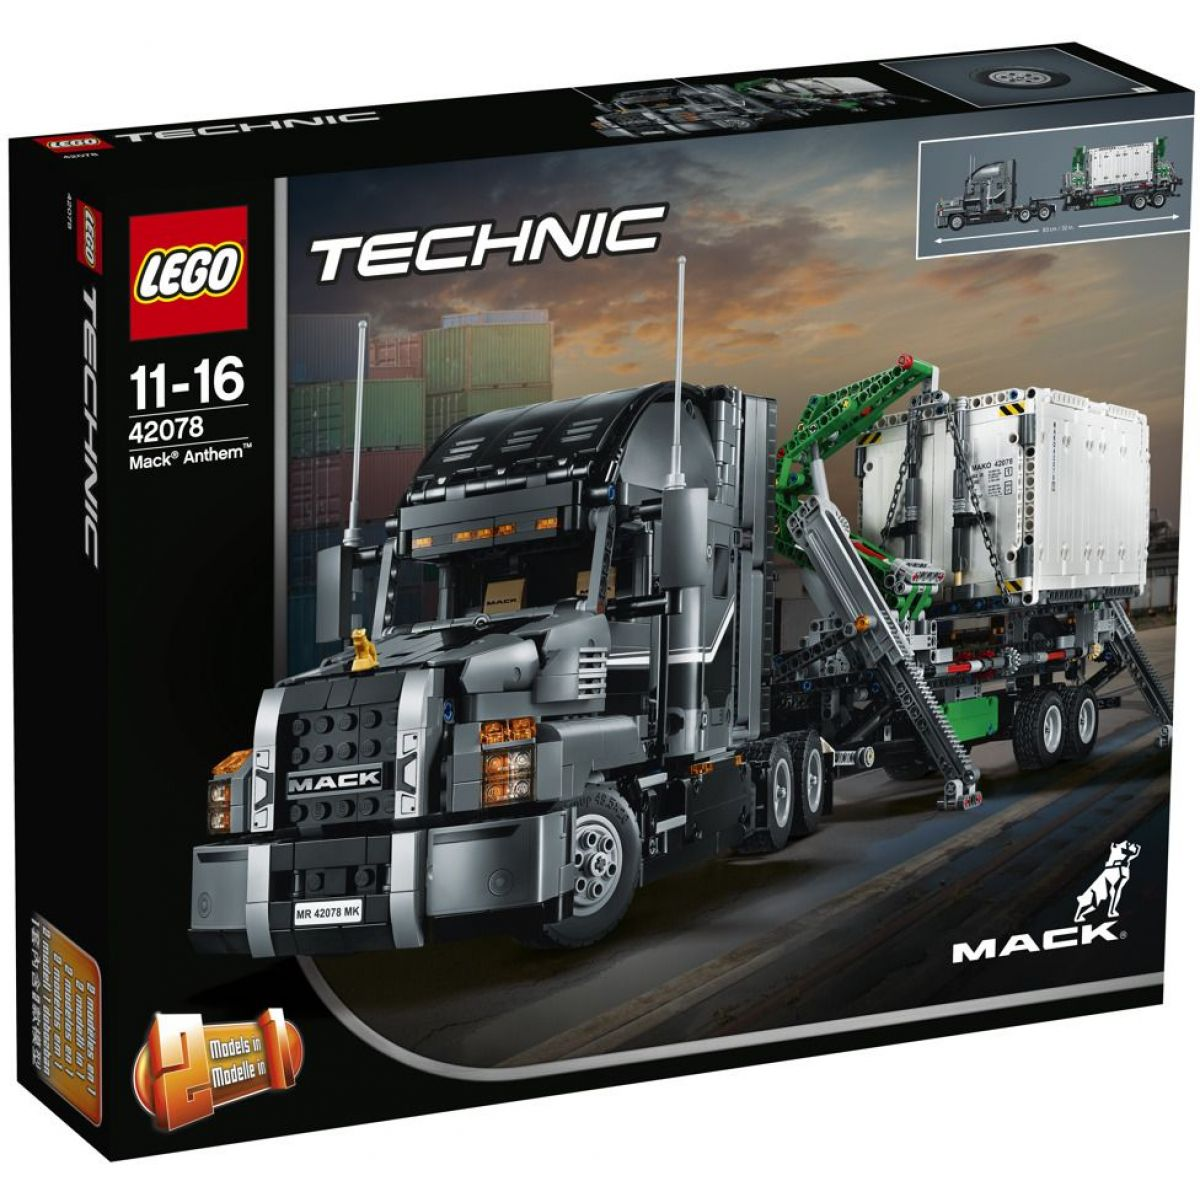 LEGO Technic 42078 Mack nákladiak